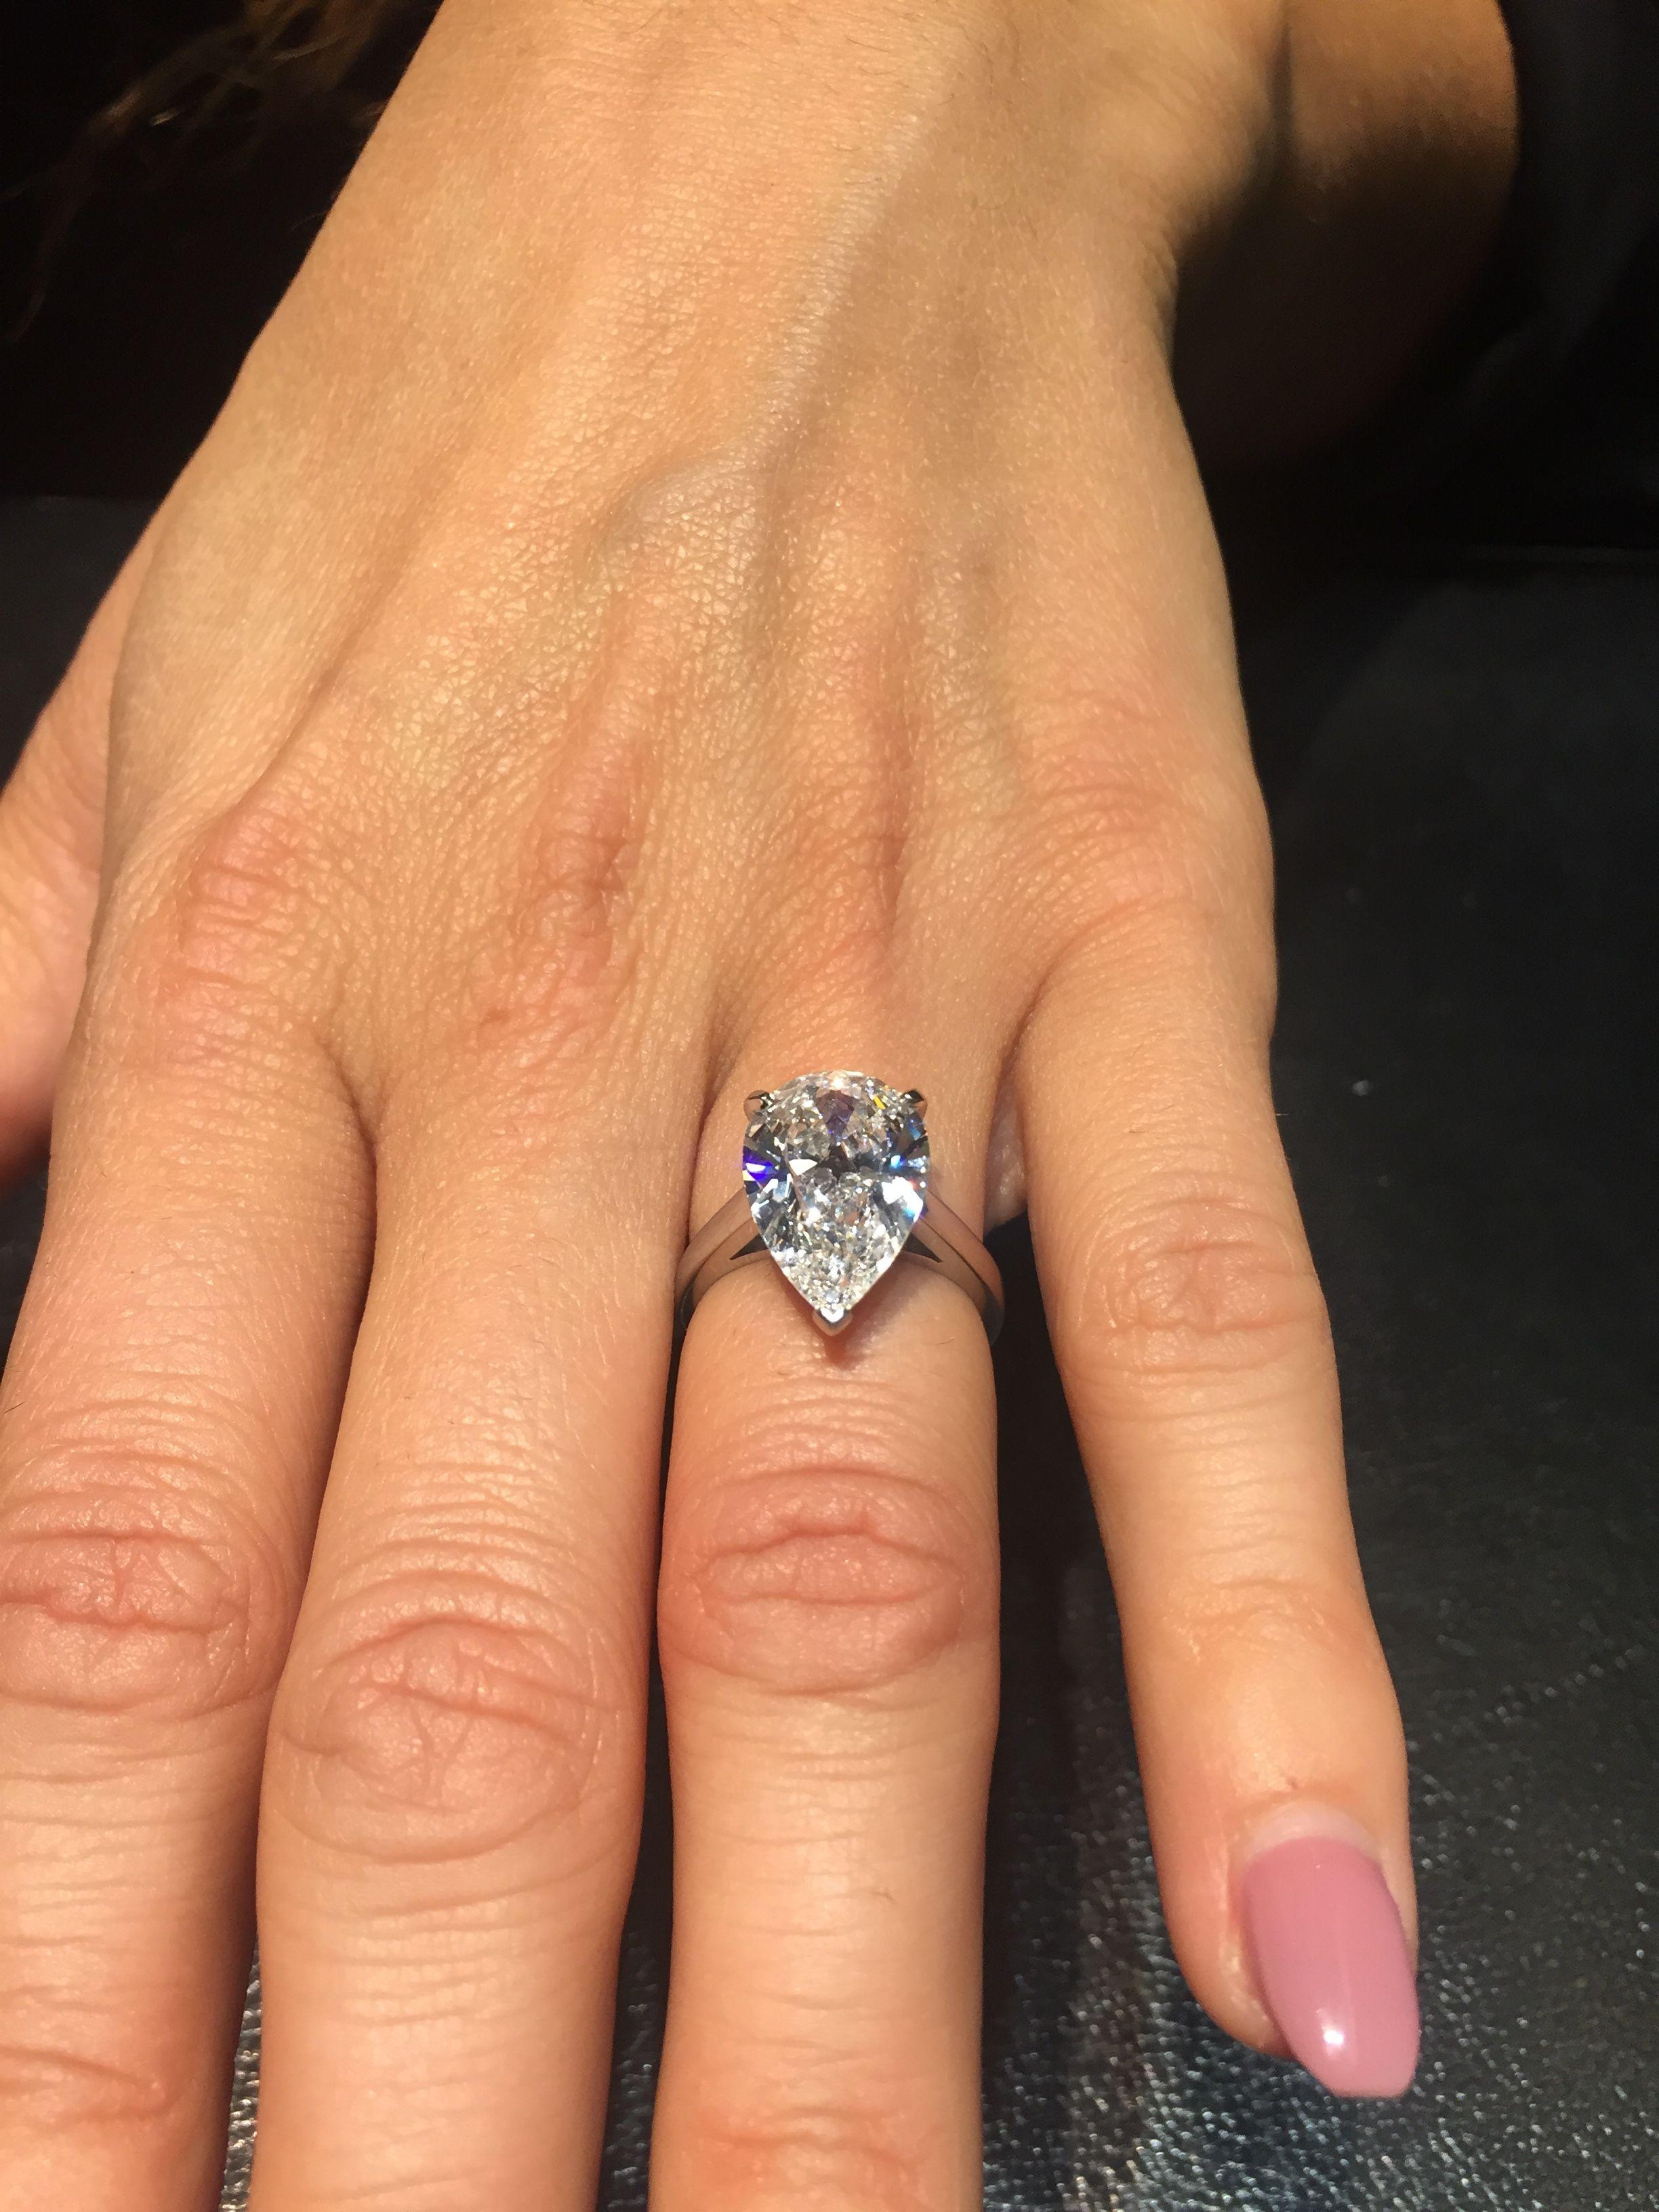 698f3134da607 6 carat pear diamond engagement ring - $647,000 ! | Prettys ...